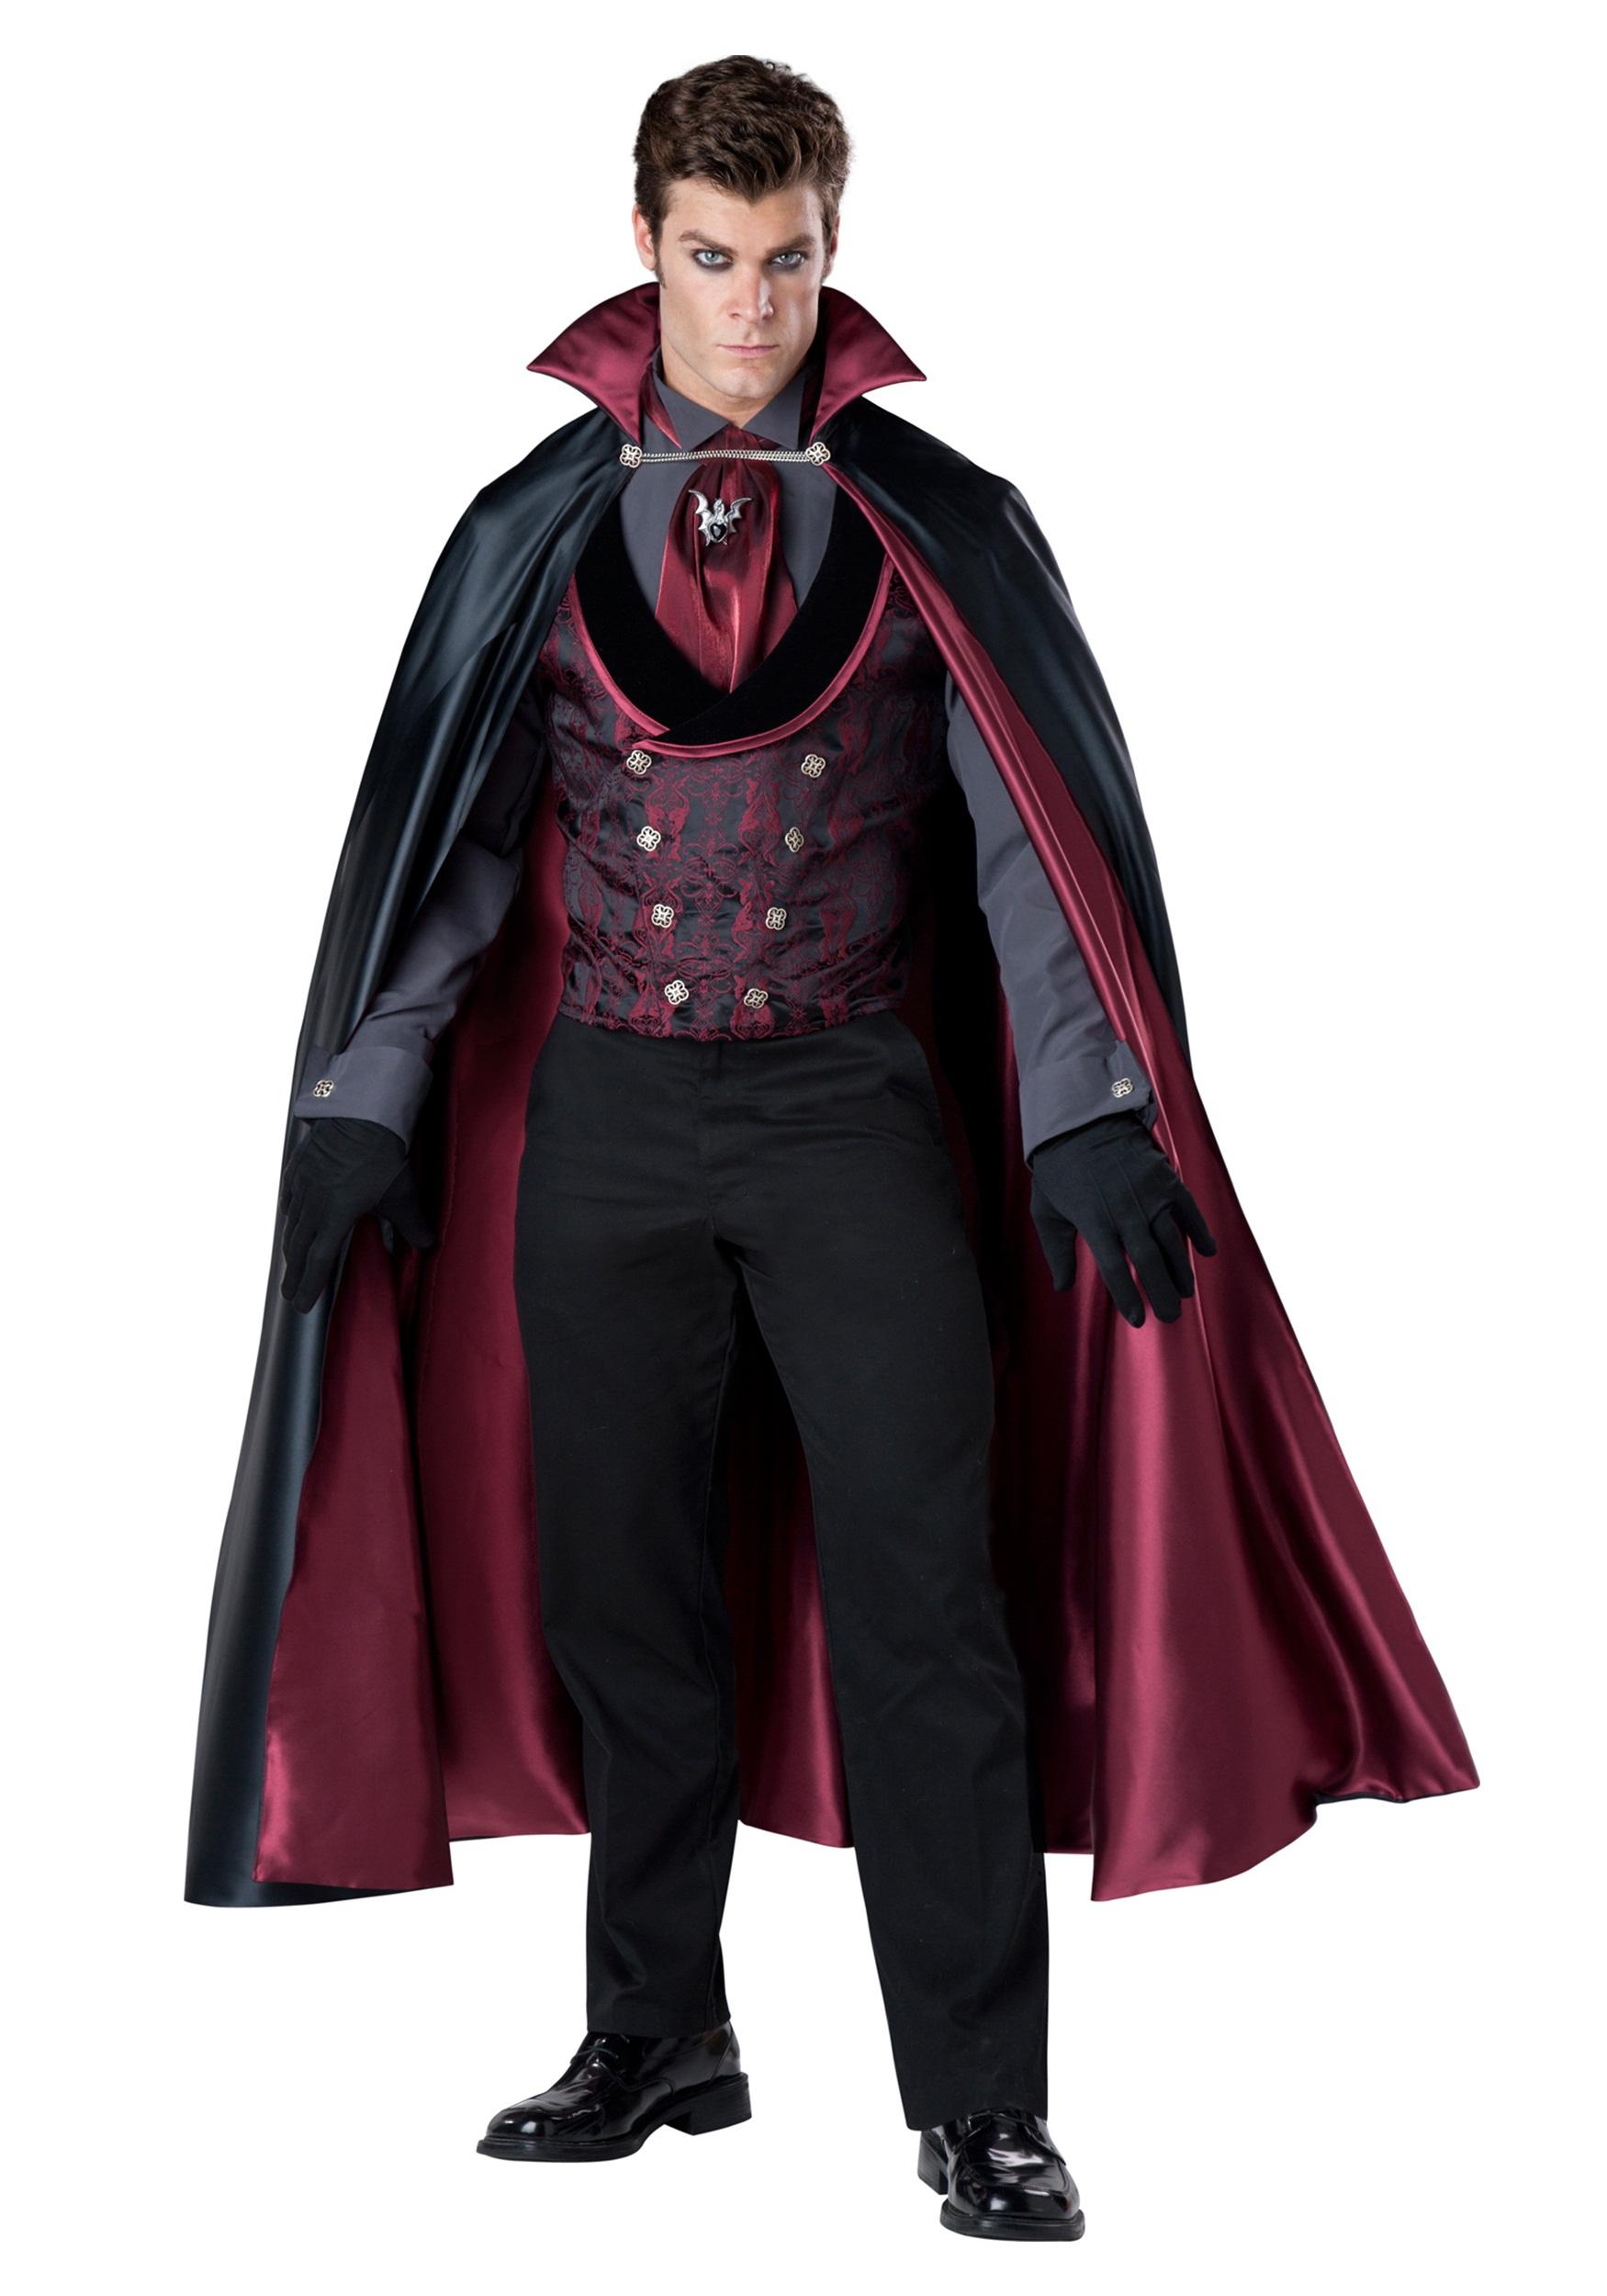 Nocturnal Count Vampire Costume for Men